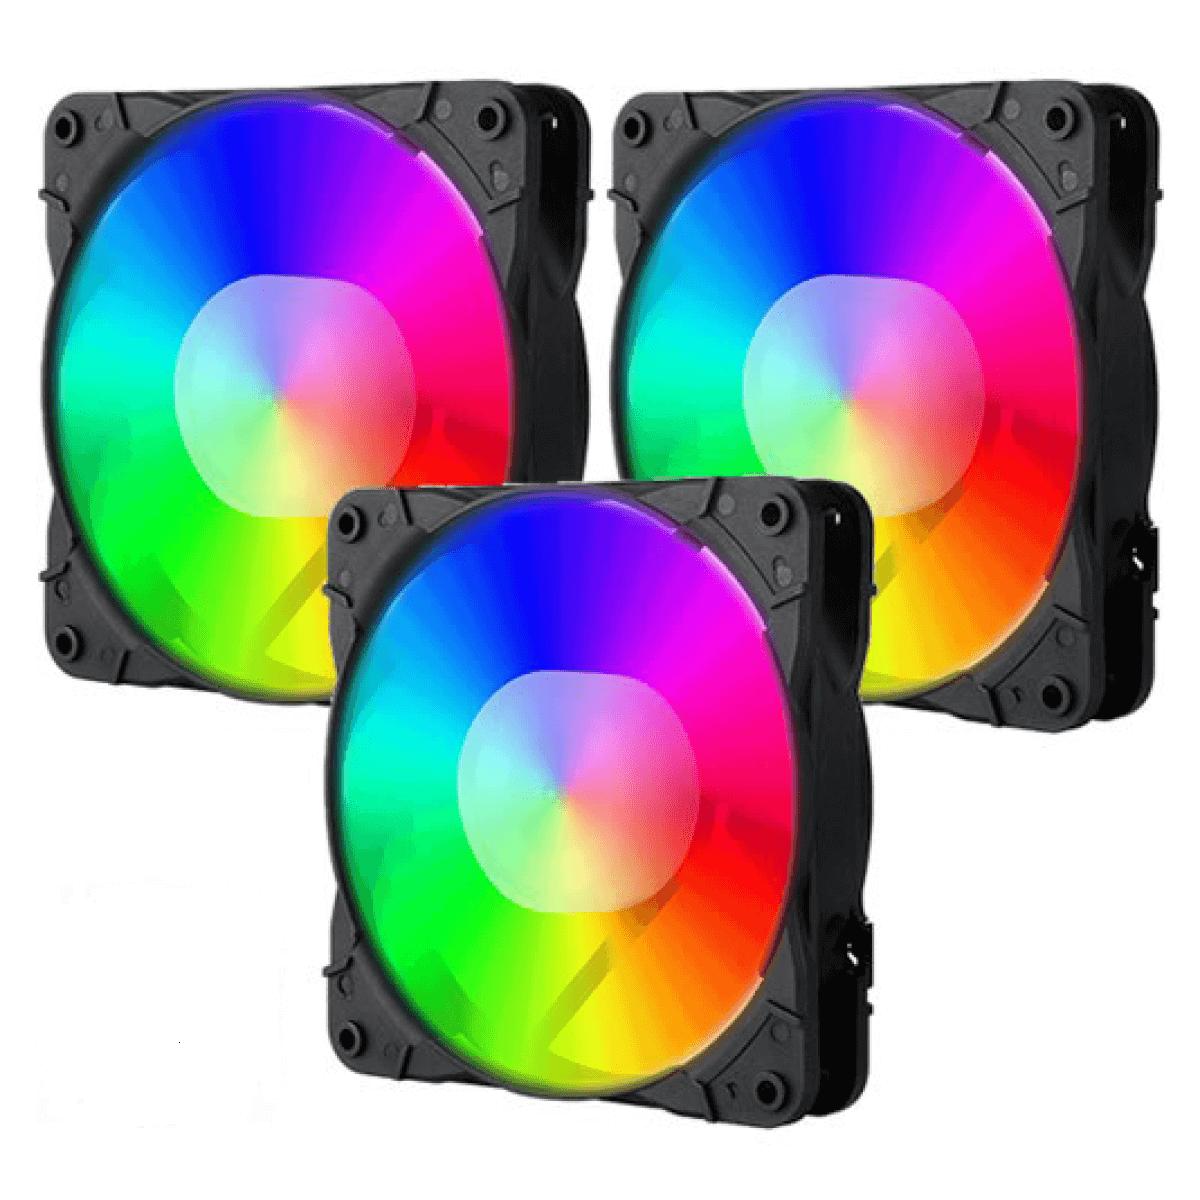 Kit Fan com 3 Unidades Redragon, RGB 120mm, Com Controladora, GC-F007